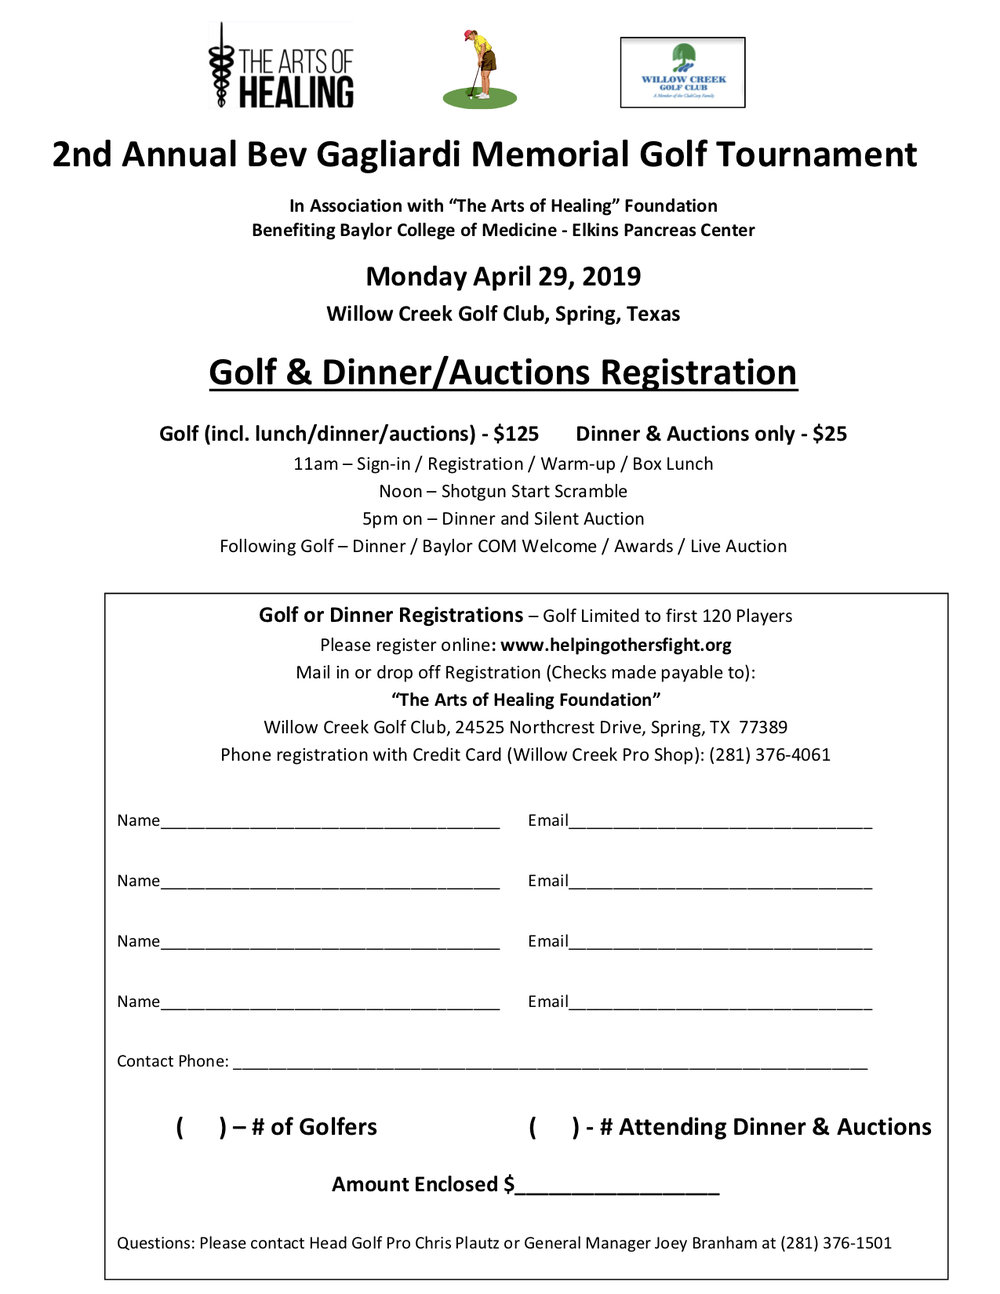 3 BGagliardi Golf Tournament Flyer Final (042919) No Cover.jpg